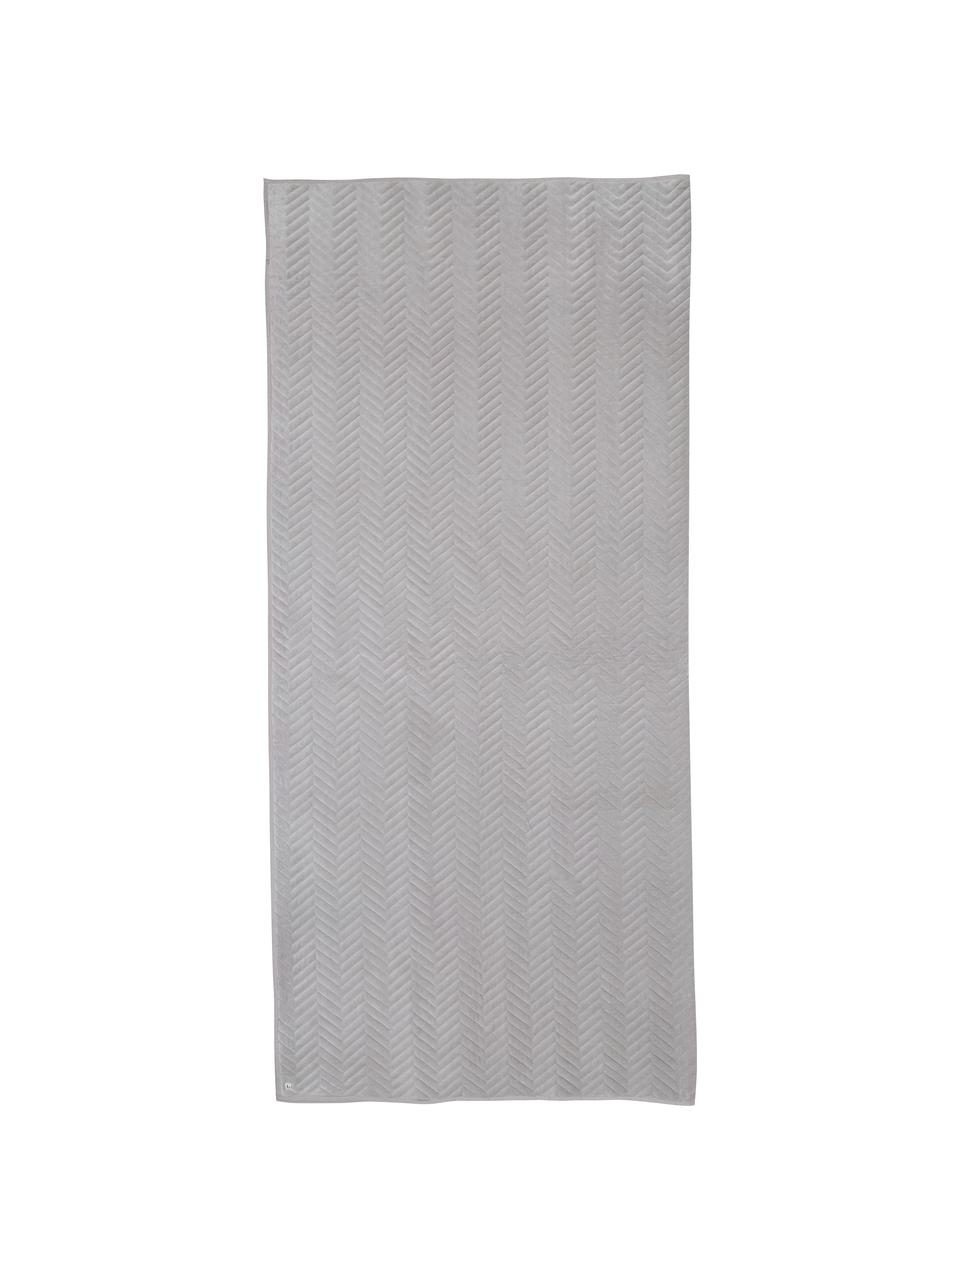 Copriletto in velluto grigio beige Chevron, Velluto, Grigio beige, Larg. 240 x Lung. 260 cm